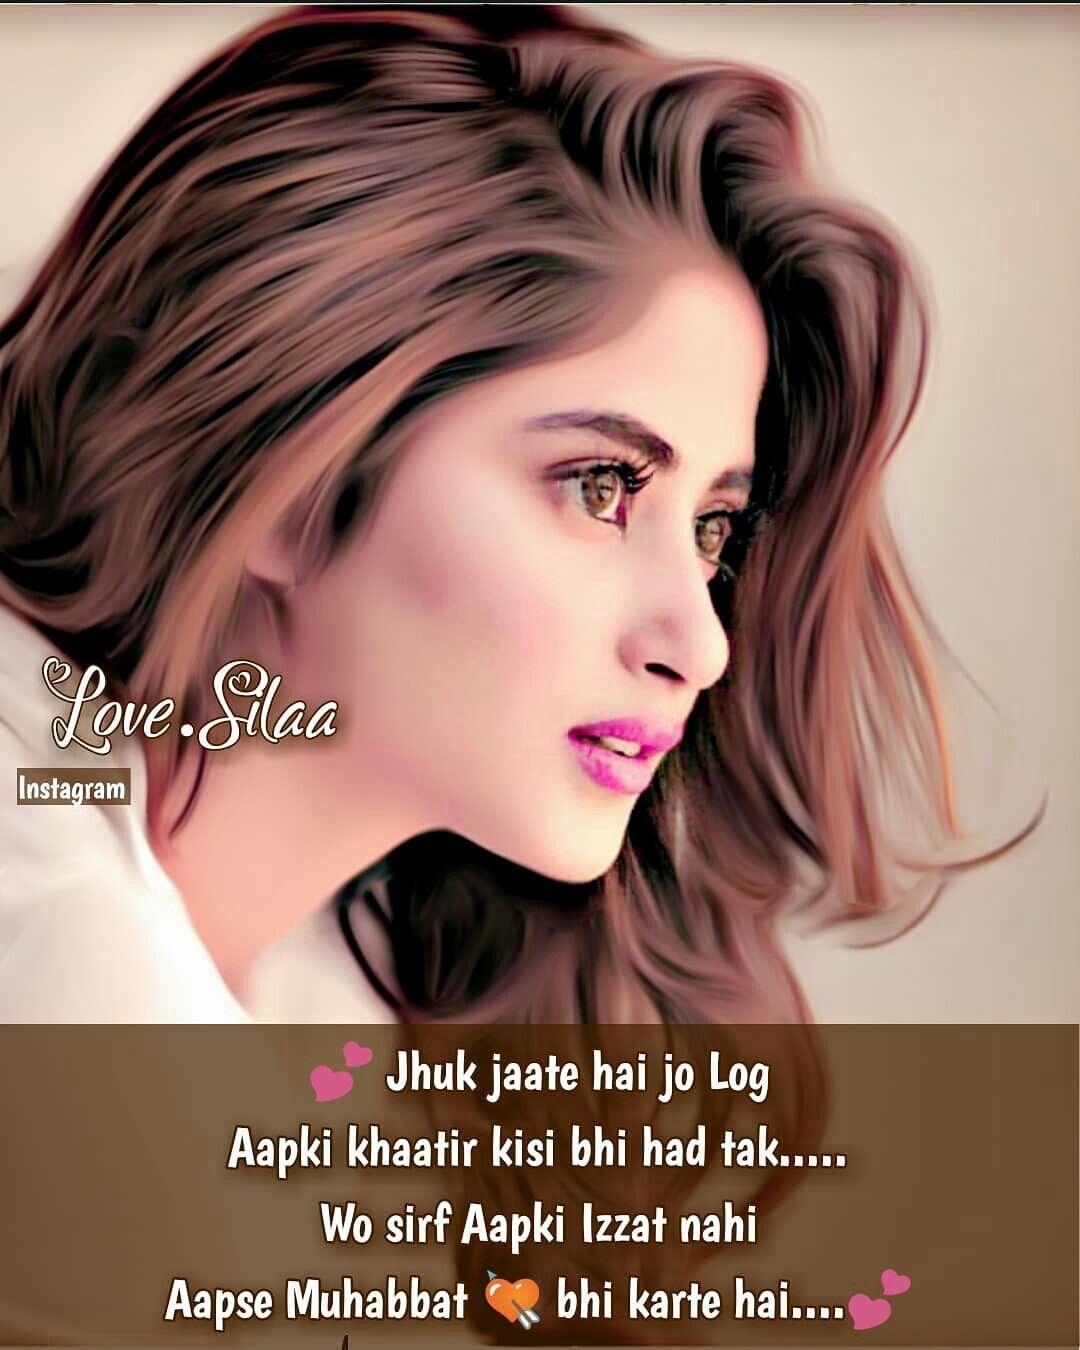 Pin by Aish on Aish  Pinterest  Heart touching shayari Feelings